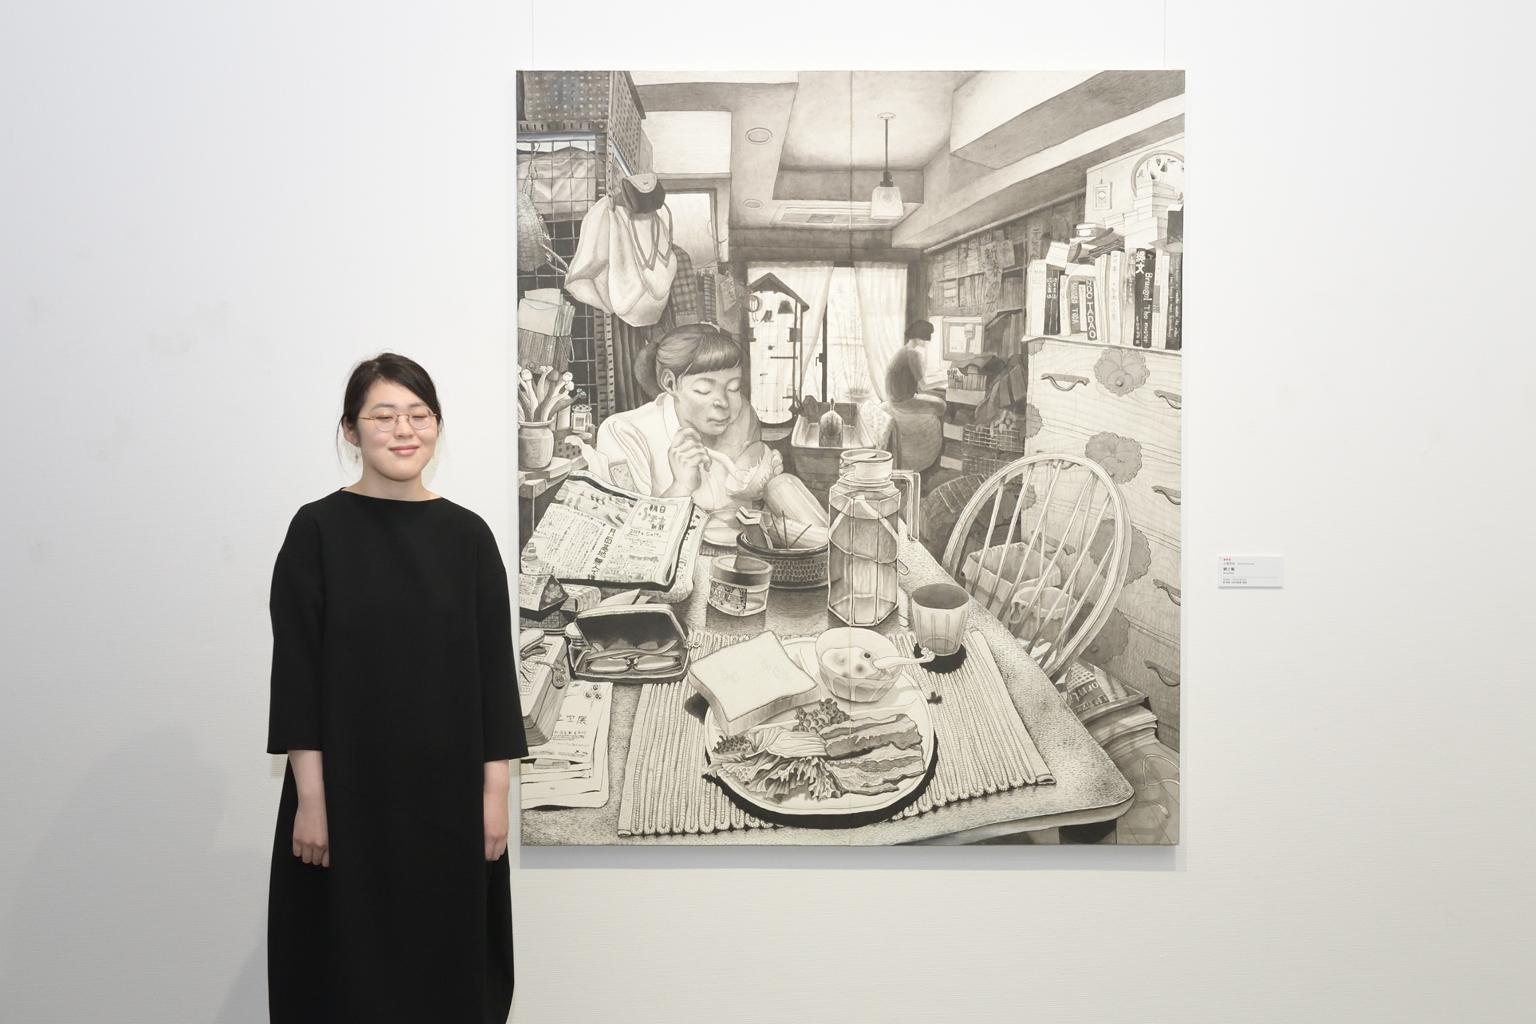 FACE2020優秀賞・小俣花名さんと作品《朝ご飯》